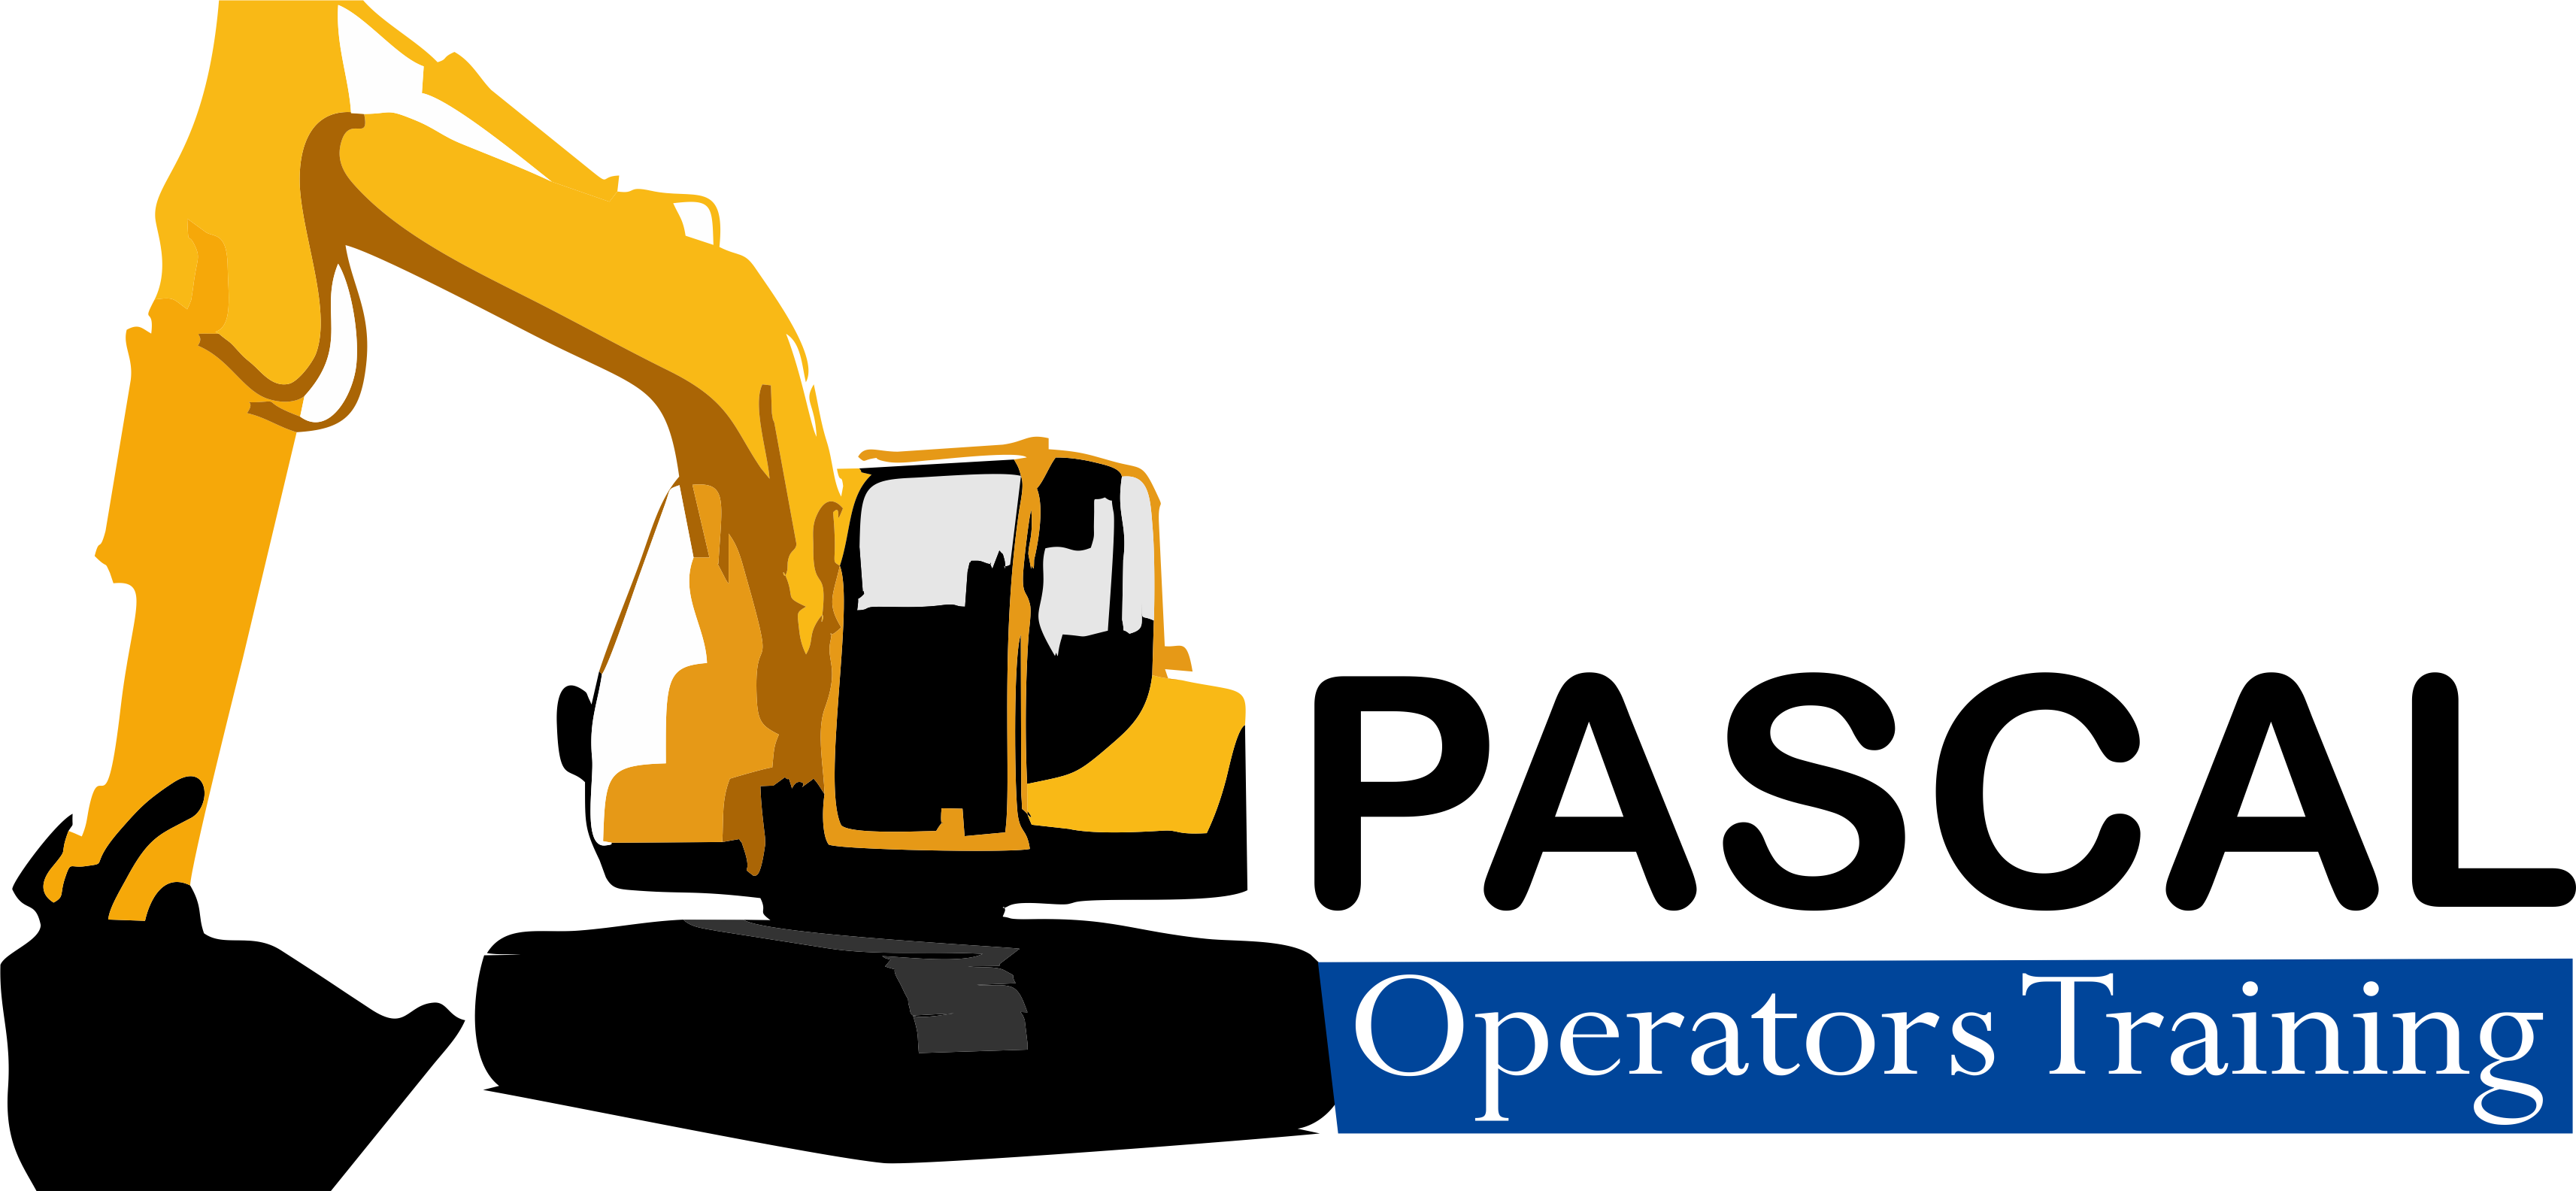 Heavy duty certificates programs. Excavator clipart tlb